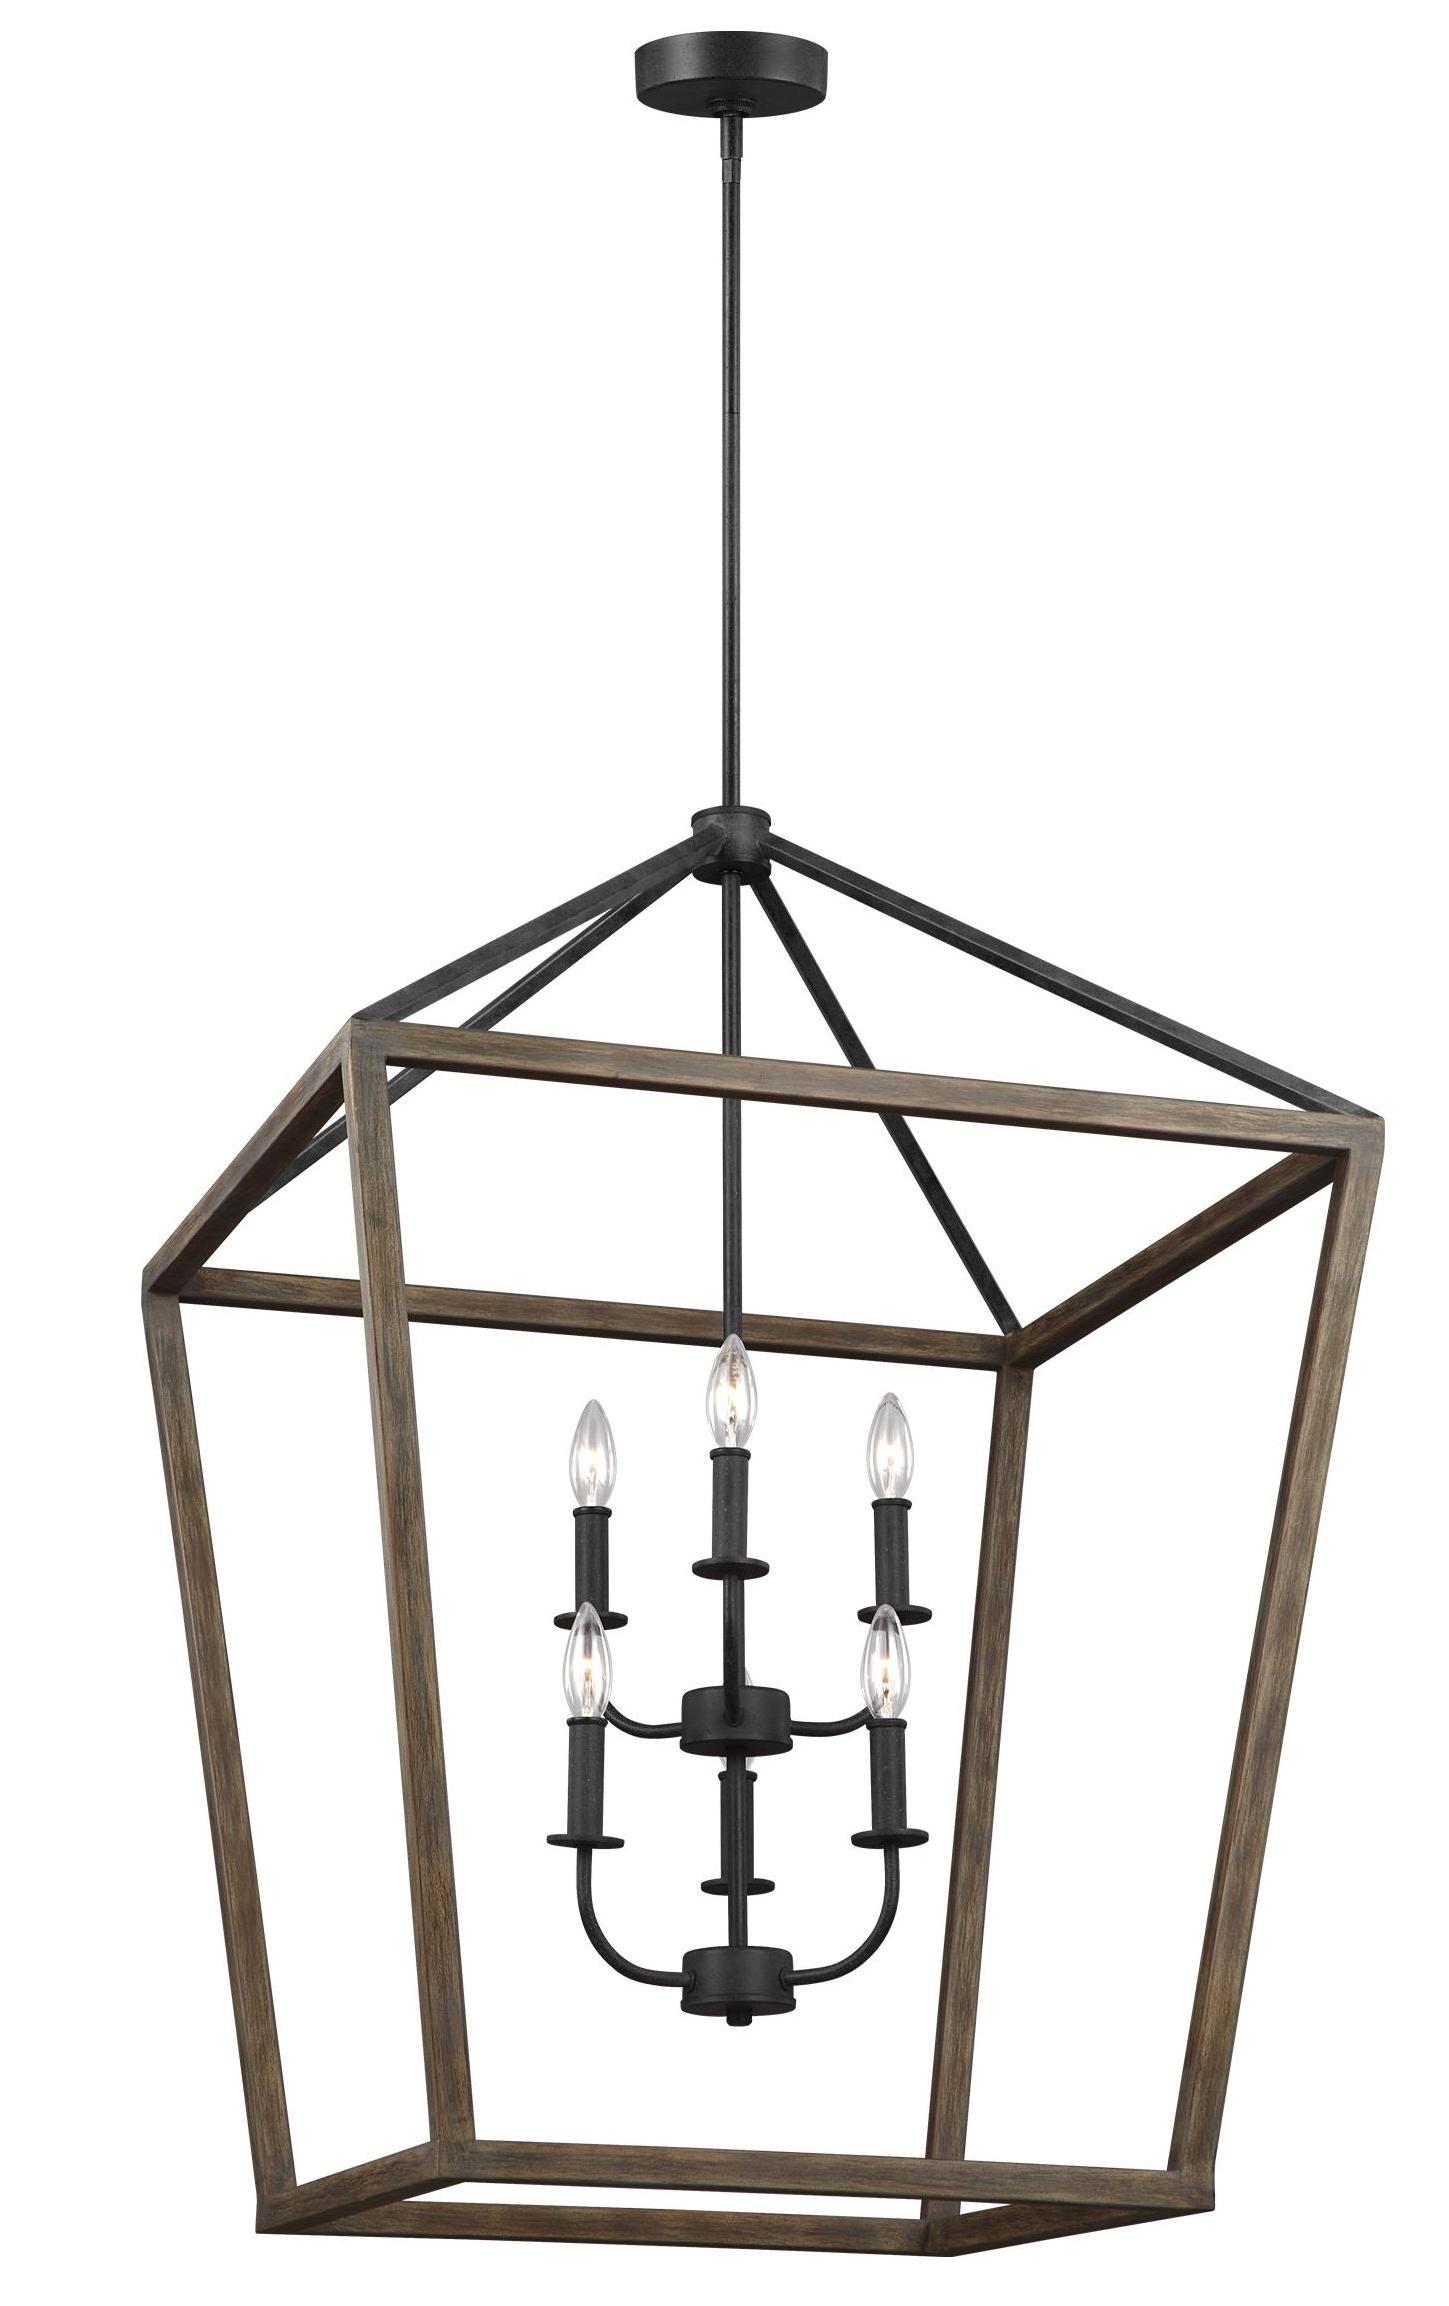 Natarsha 6 Light Lantern Geometric Pendant In Preferred Carmen 8 Light Lantern Tiered Pendants (View 19 of 25)